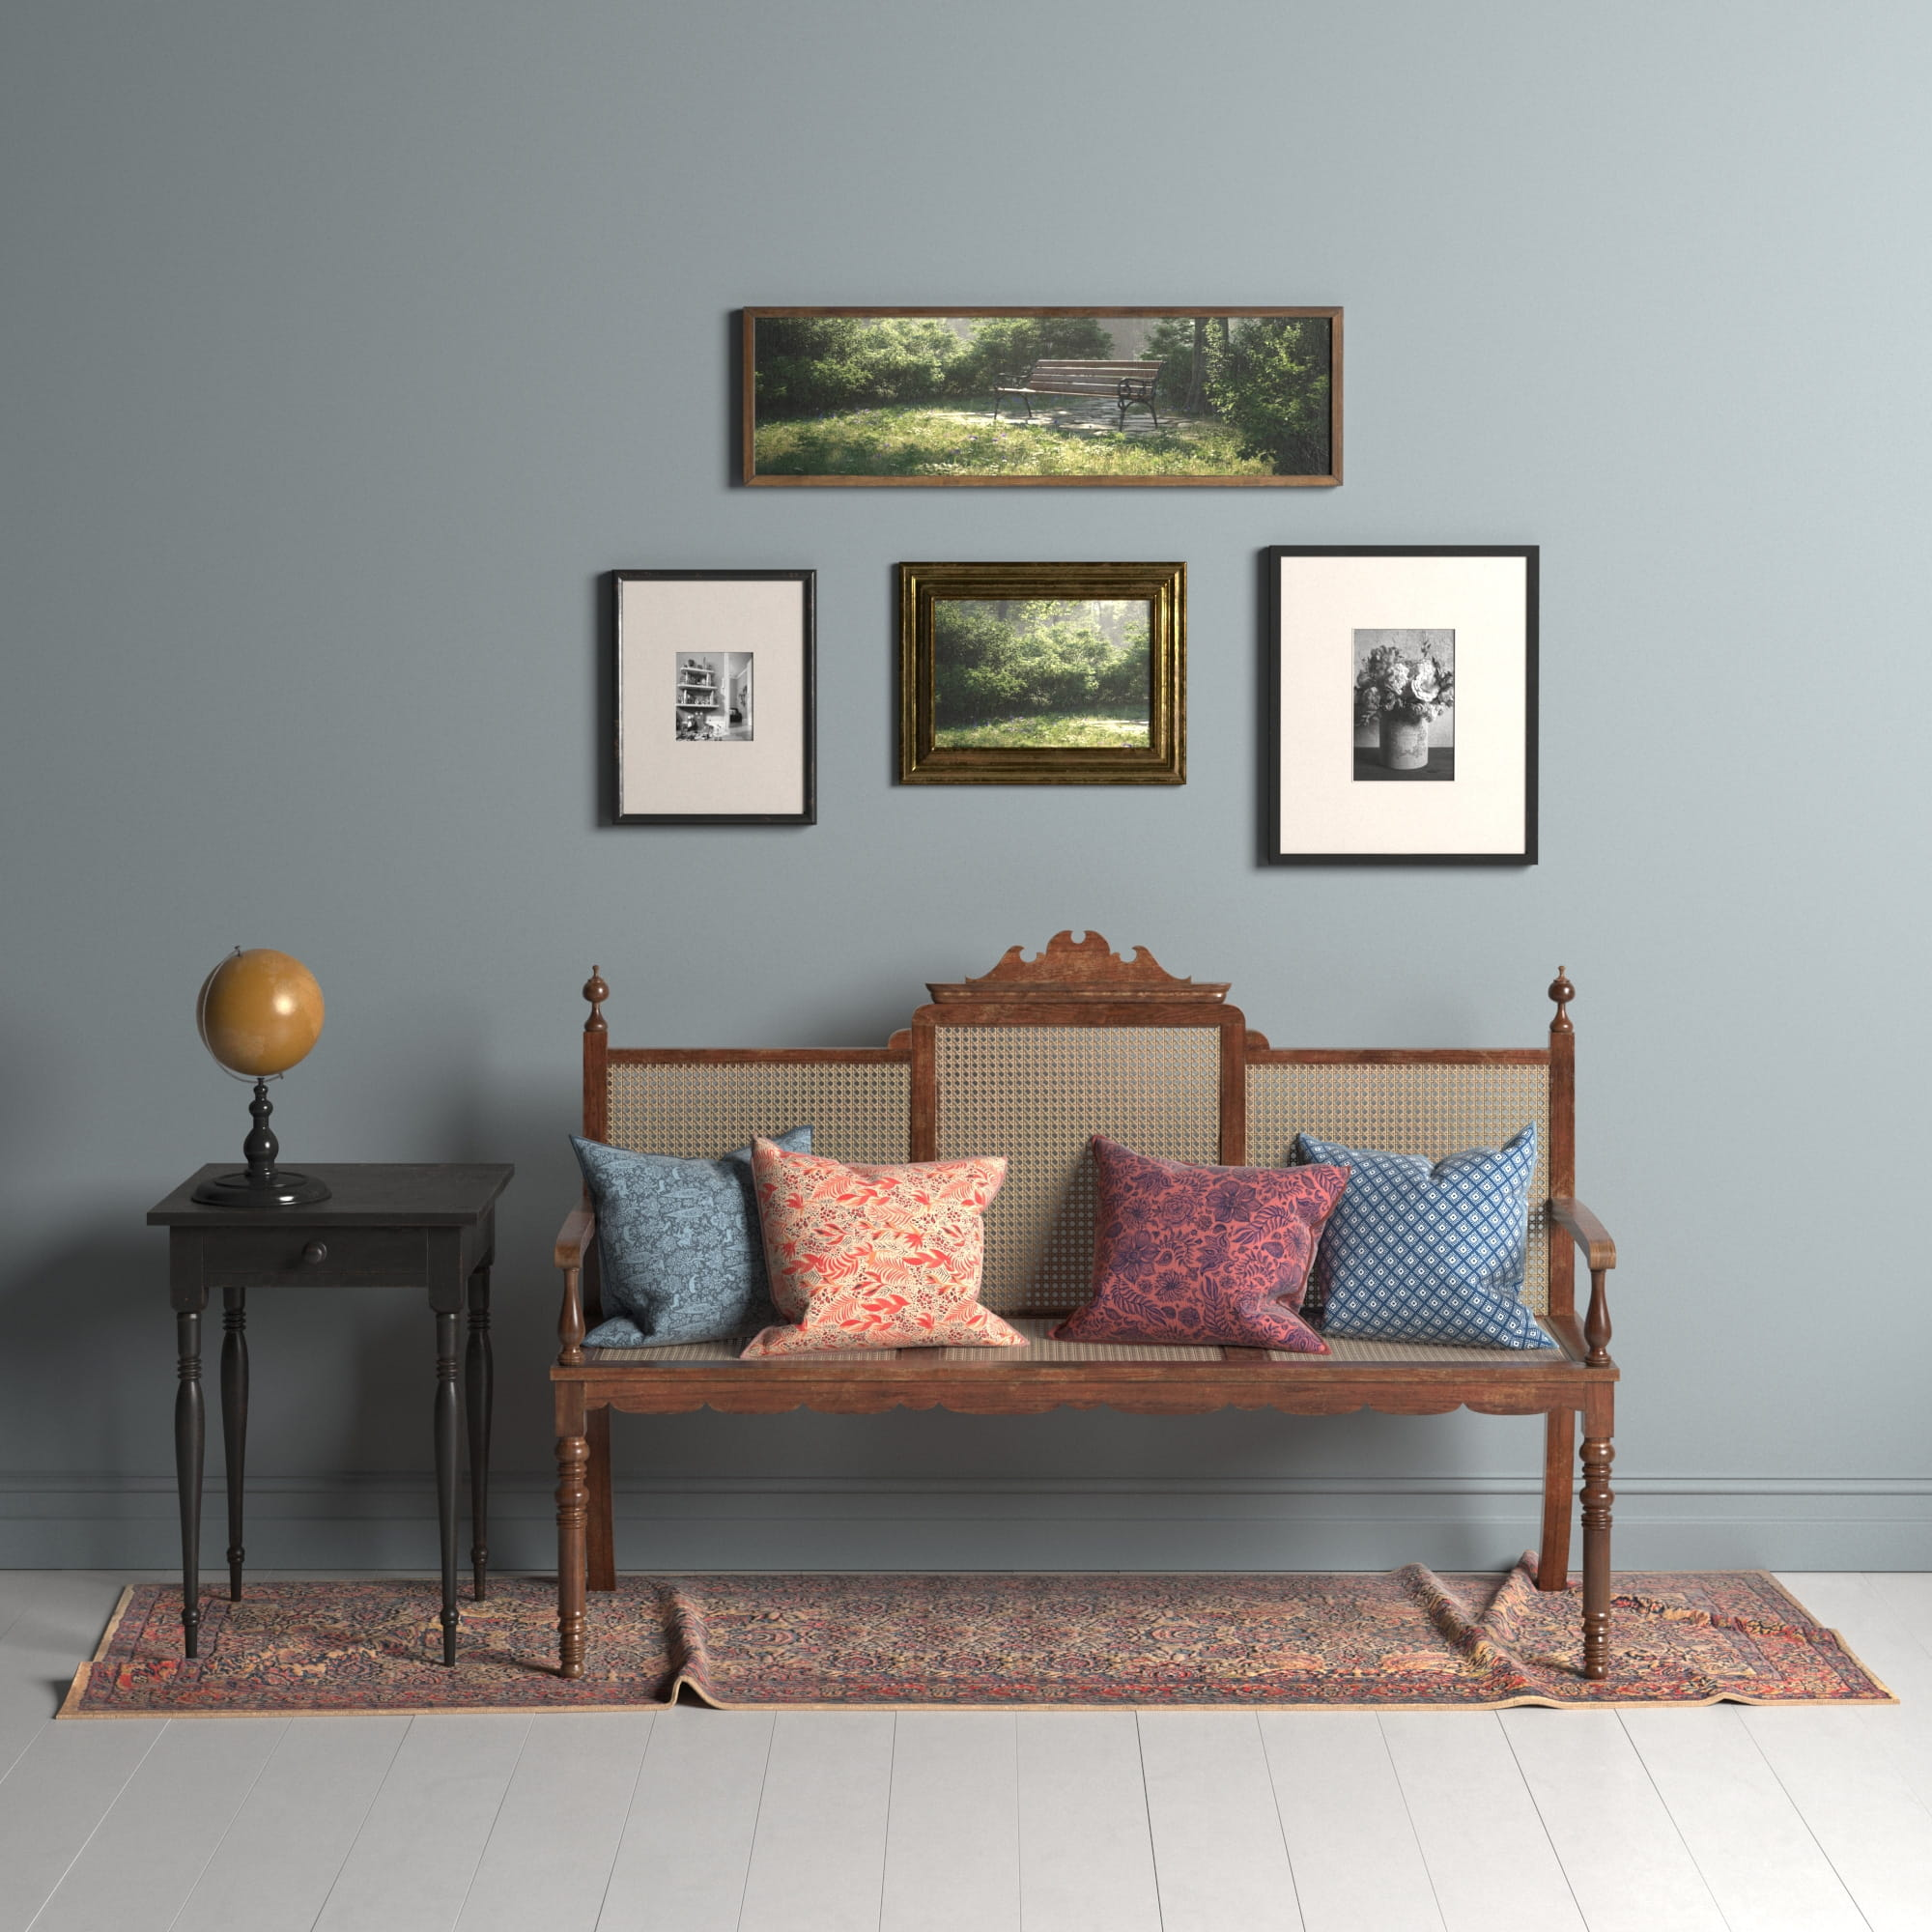 furniture set 12 AM225